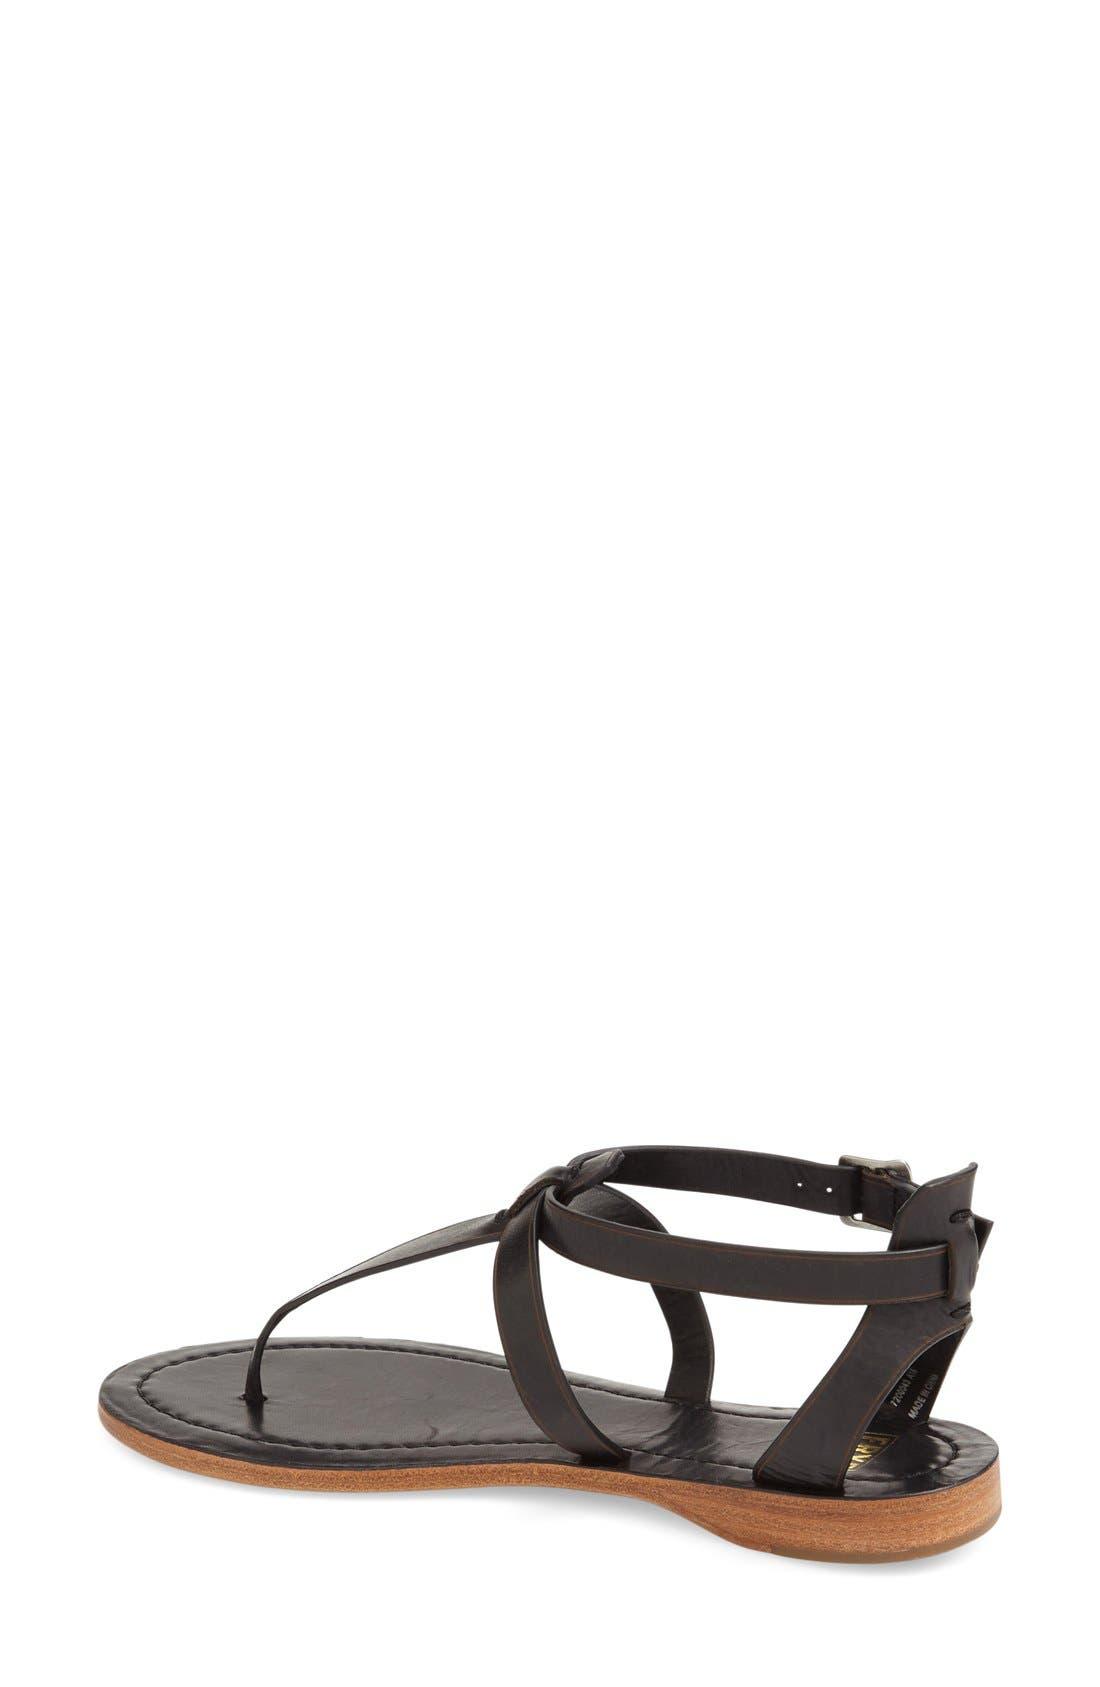 'Rachel' T-Strap Sandal,                             Alternate thumbnail 2, color,                             Black Leather